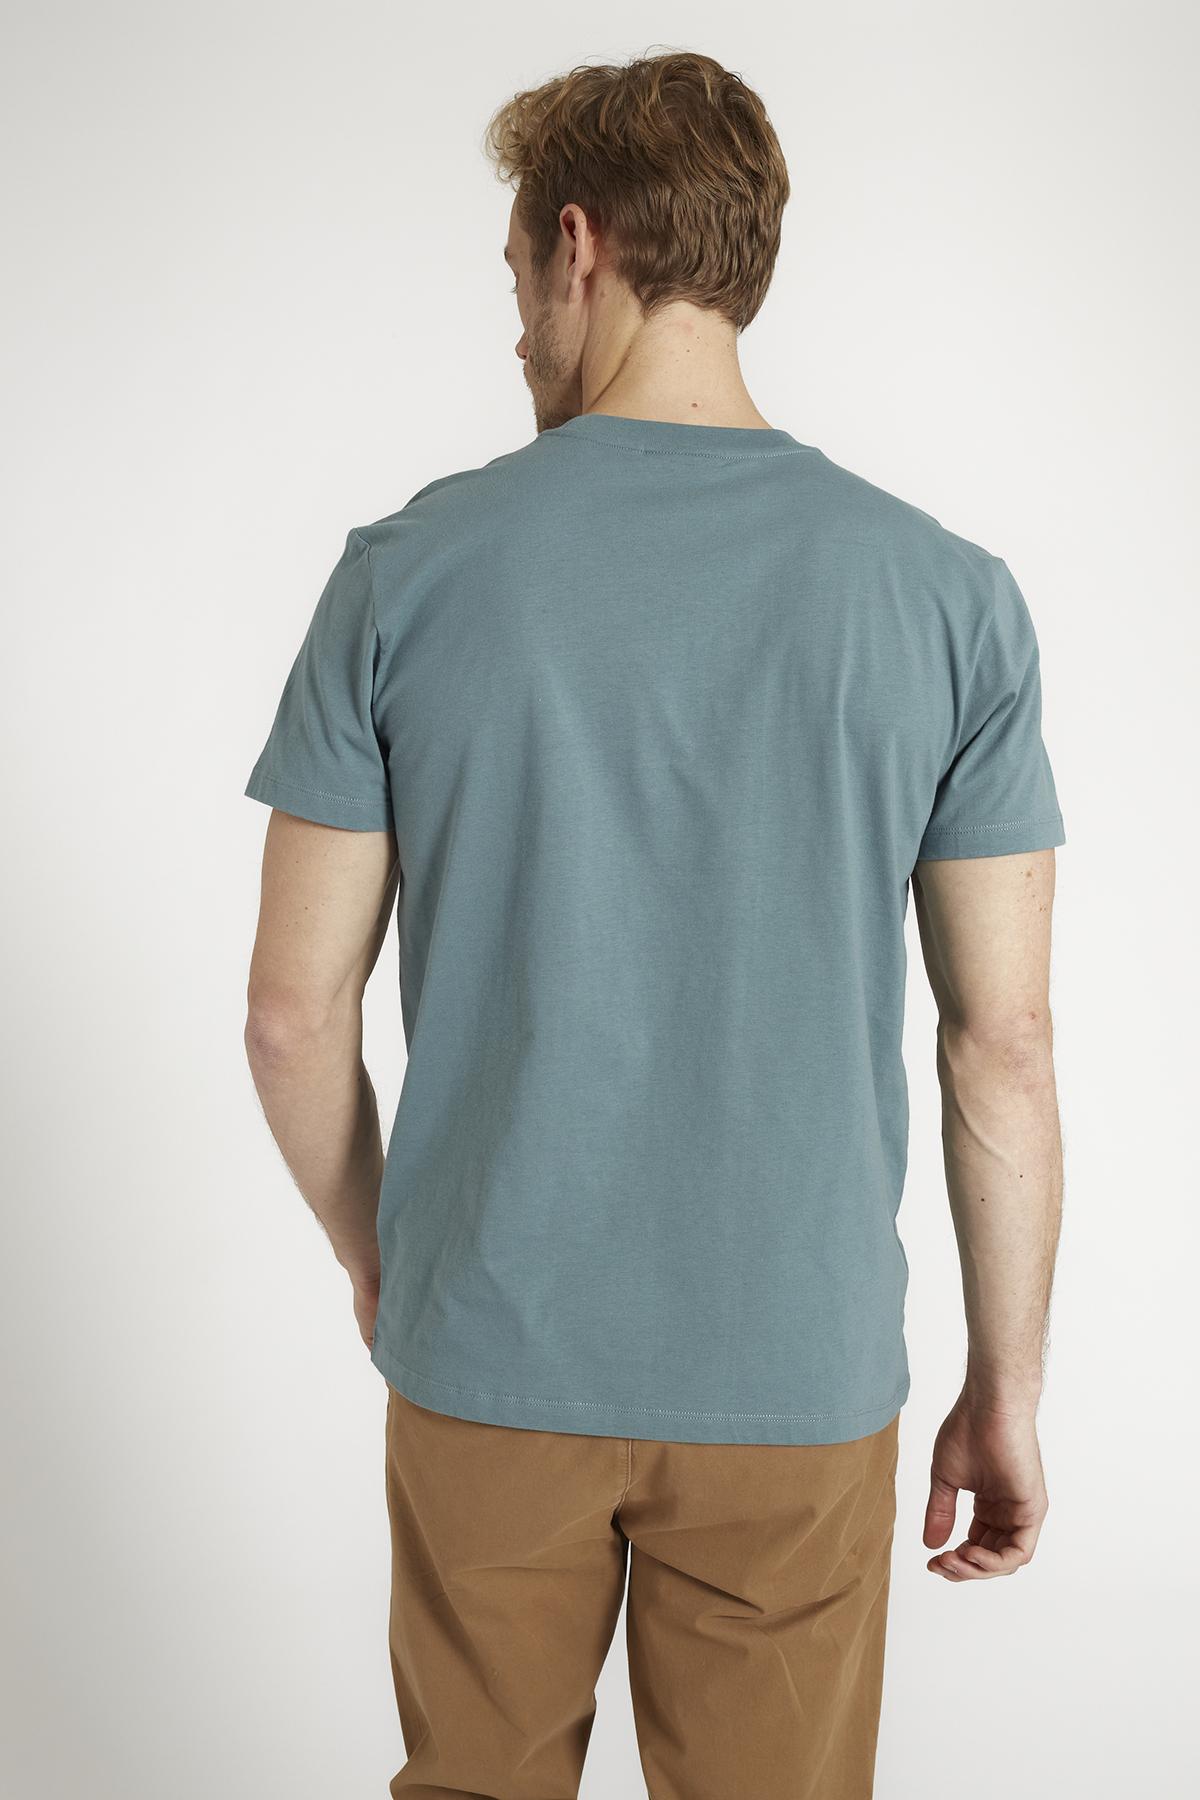 Herren-Shirt AGAVE HOUSExBIKER lake green